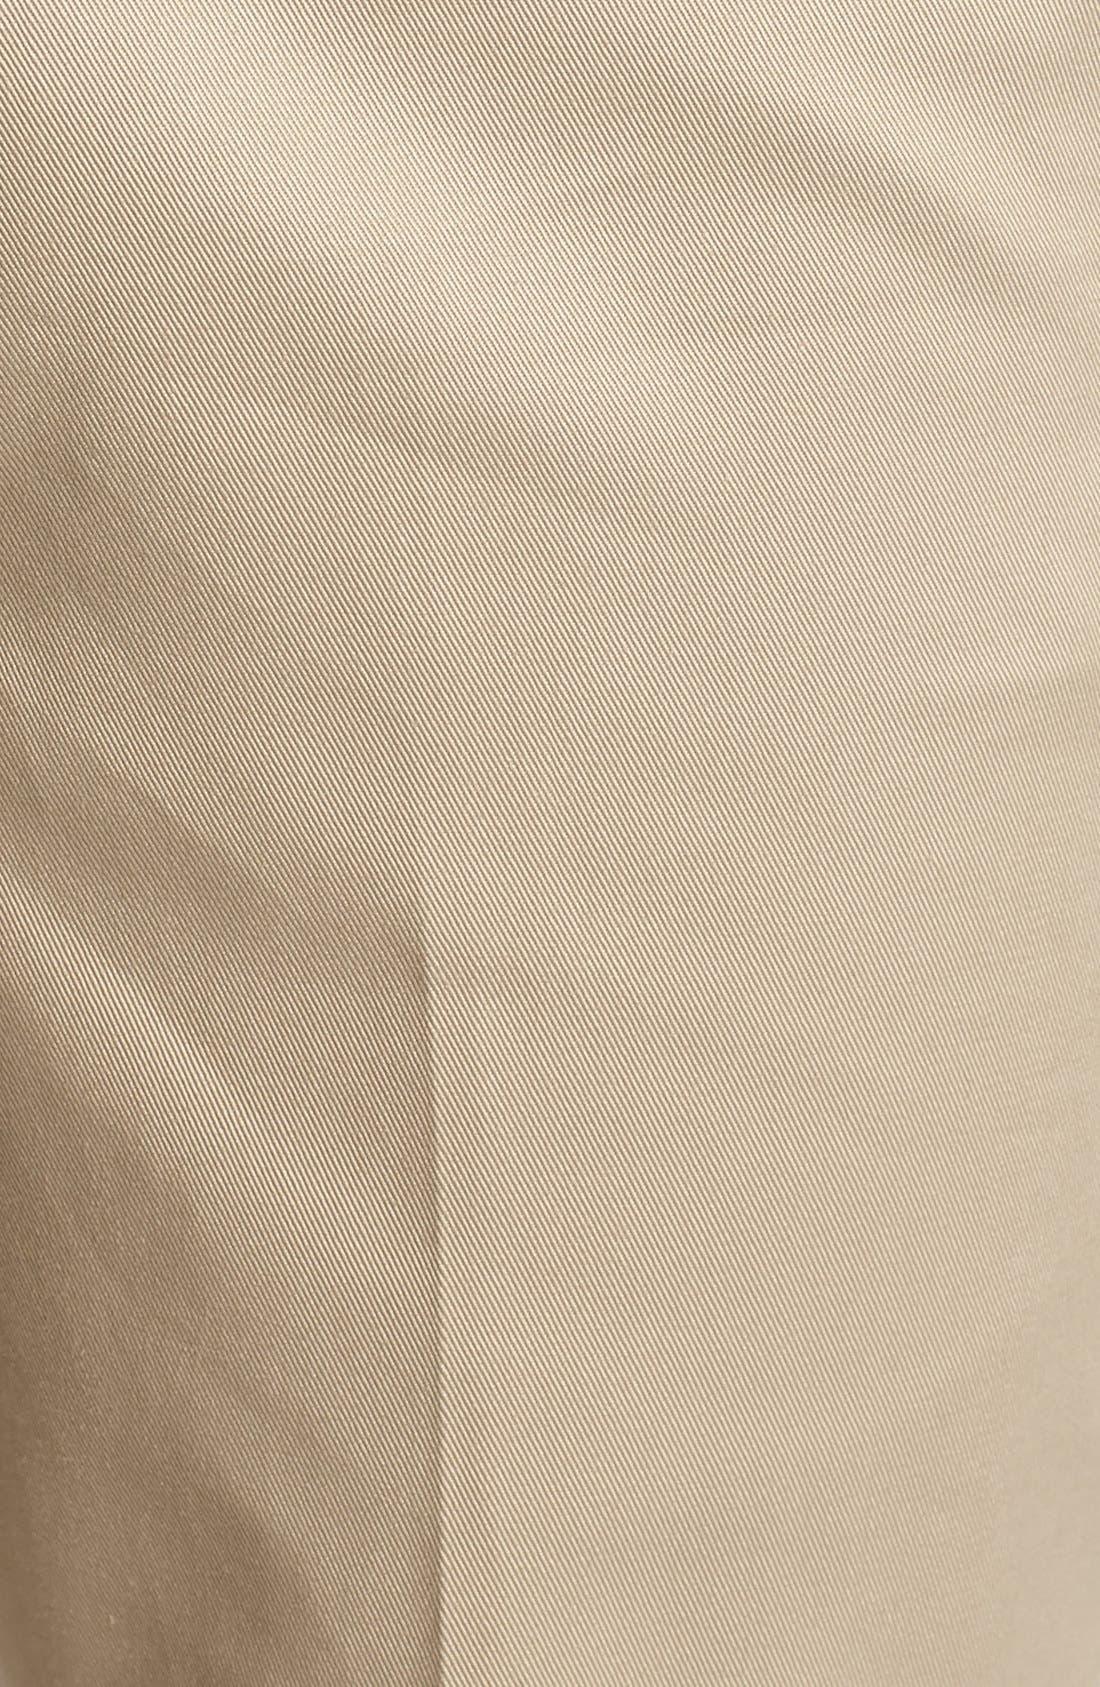 Flat Front Wrinkle Resistant Cotton Trousers,                             Alternate thumbnail 2, color,                             Khaki